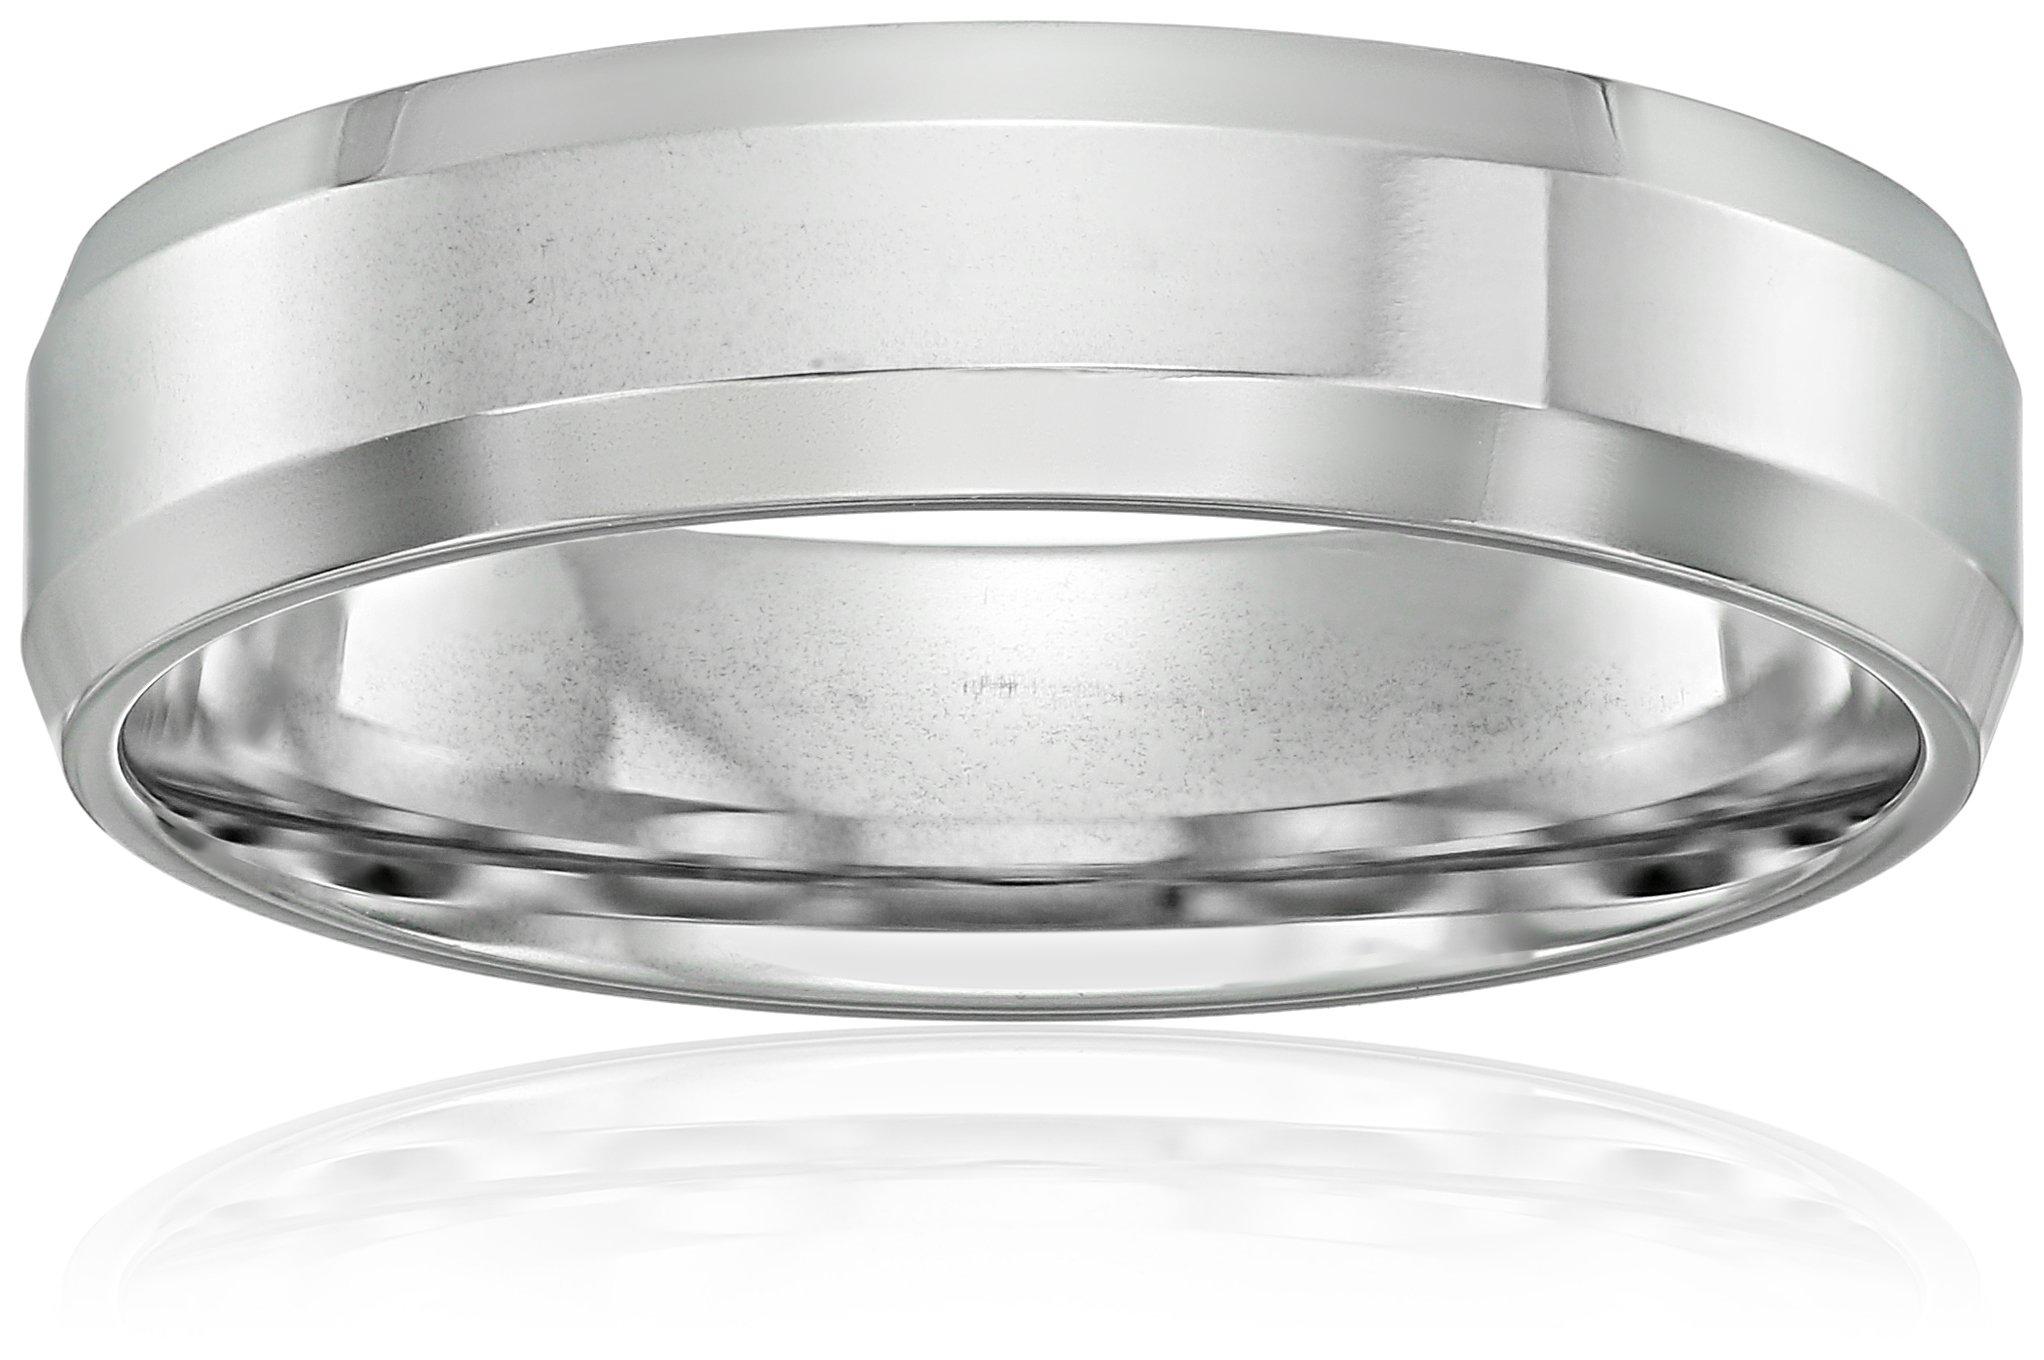 10k White Gold 6mm Comfort Fit High Polish Wedding Band with Beveled Edges, Size 10